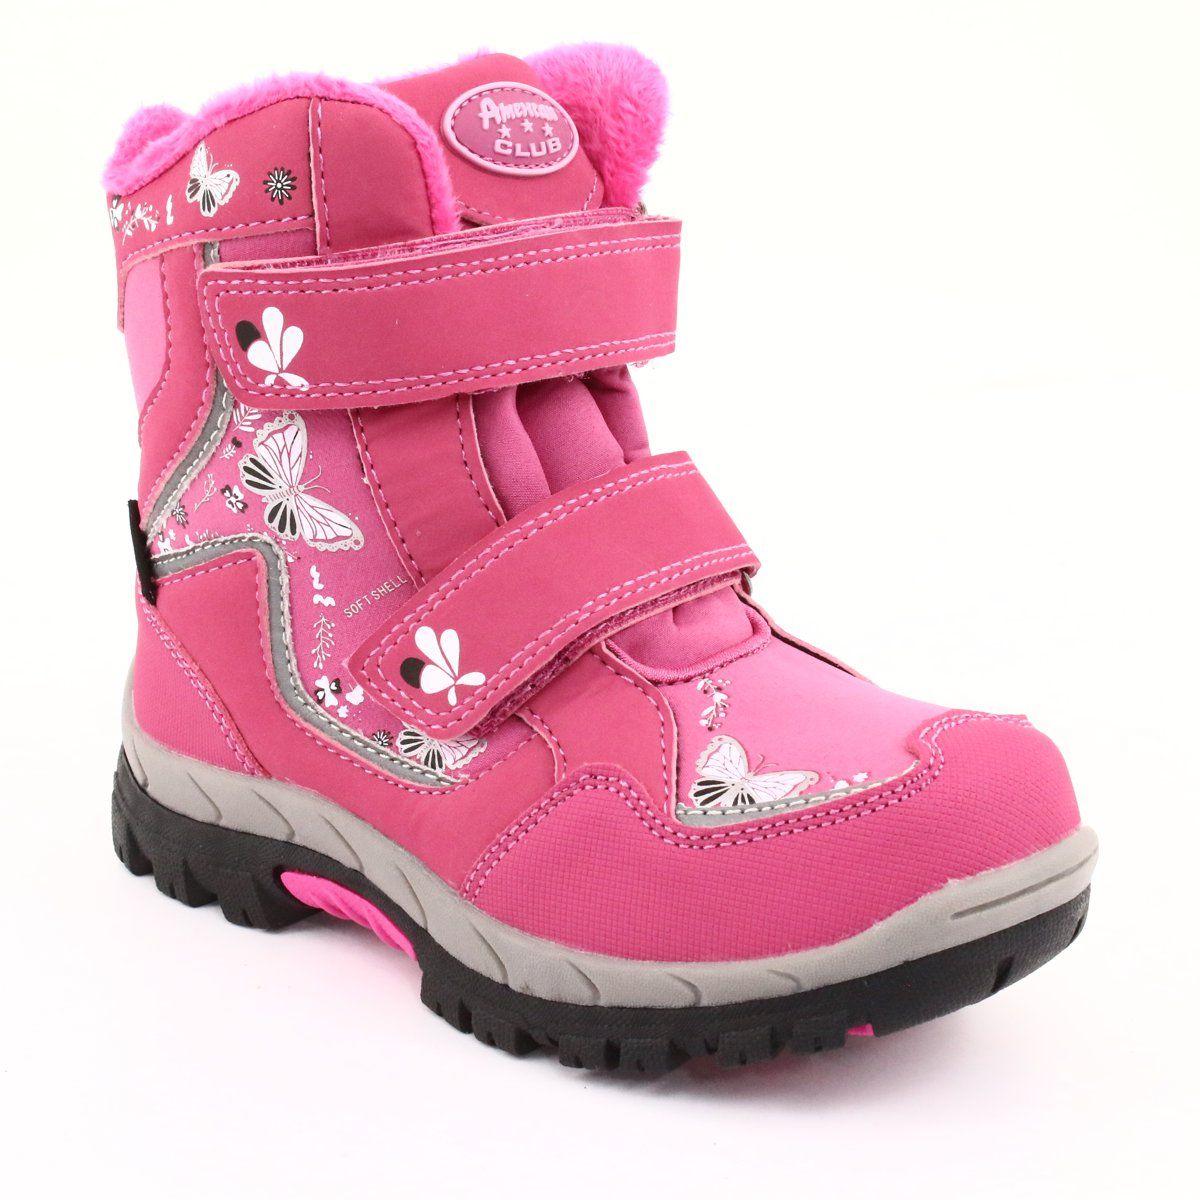 American Club Kozaki Z Membrana Hl27 Motyle Rozowe Biale Czarne Boots Childrens Boots Girls Shoes